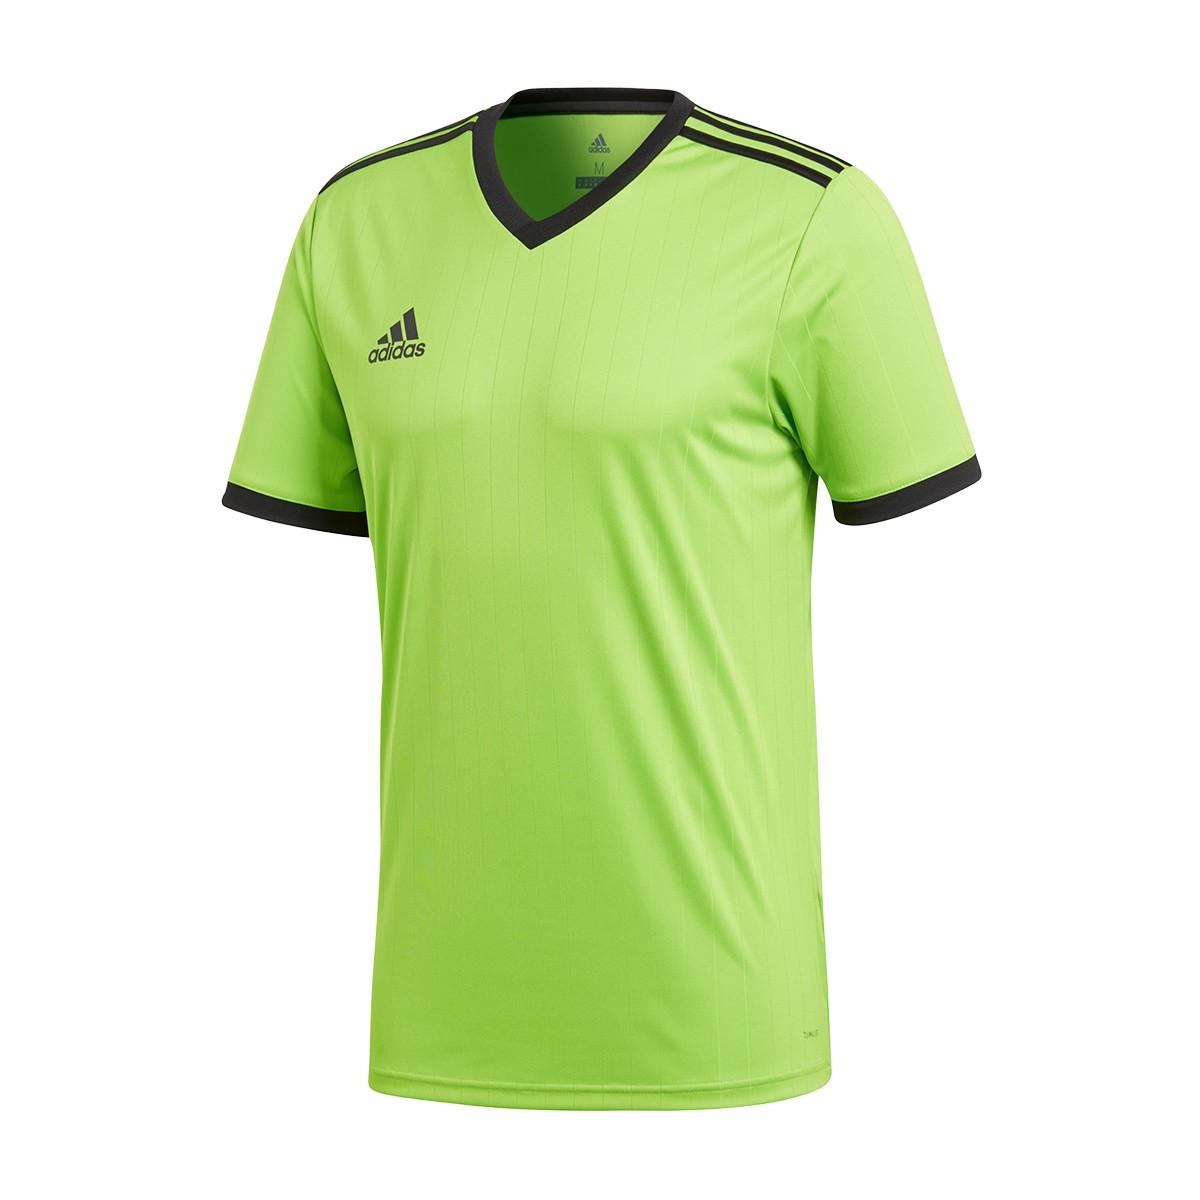 4971ae055 Jersey adidas Tabela 18 m/c Semi solar green-Black - Tienda de fútbol  Fútbol Emotion